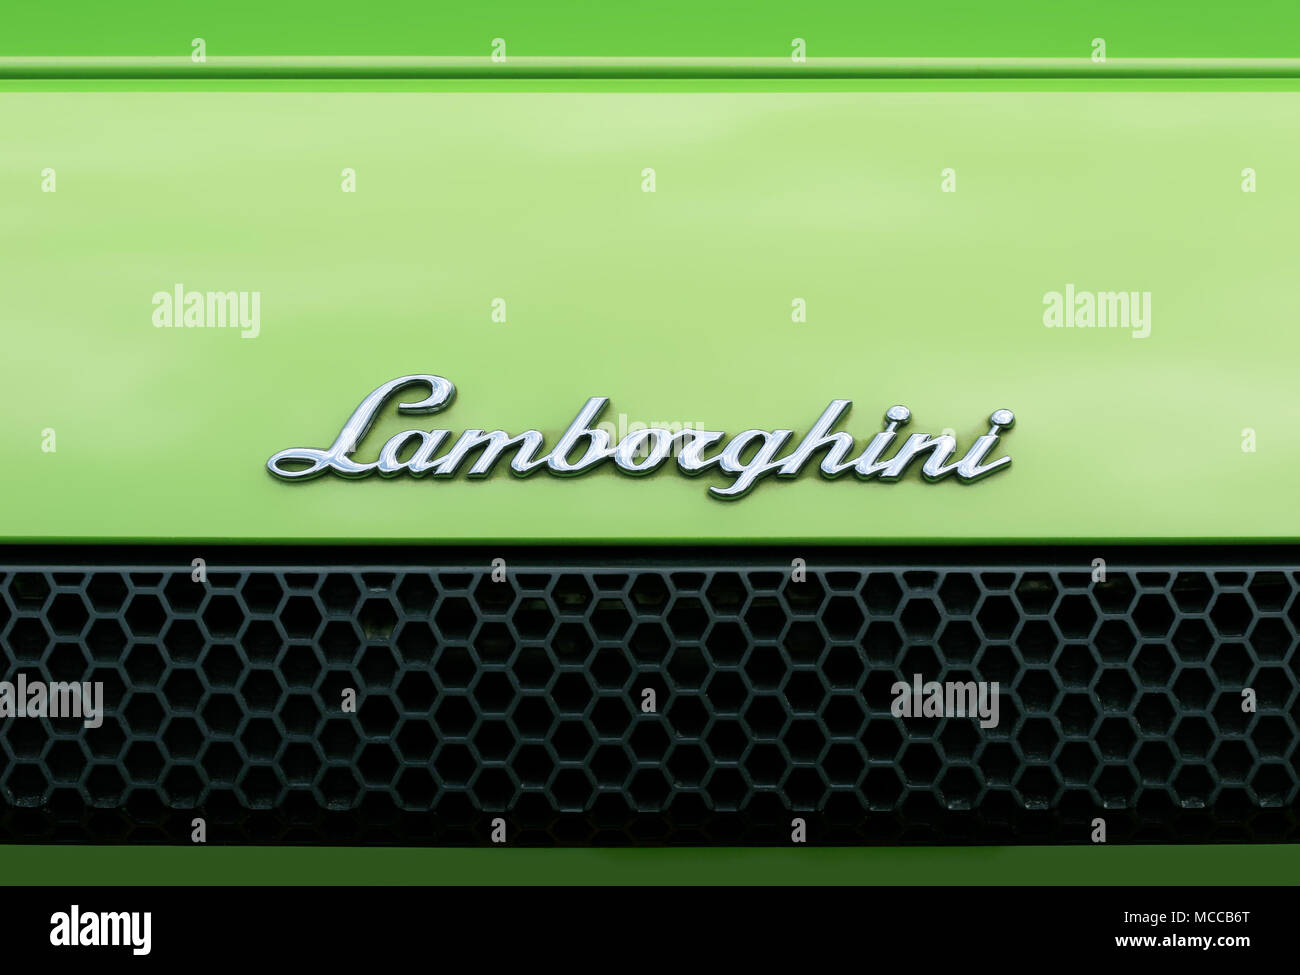 Closeup detail of a Lamborghini badge logo branding emblem and the Lamborghini text font on the rear of a lime green Lamborghini Murcielago. - Stock Image